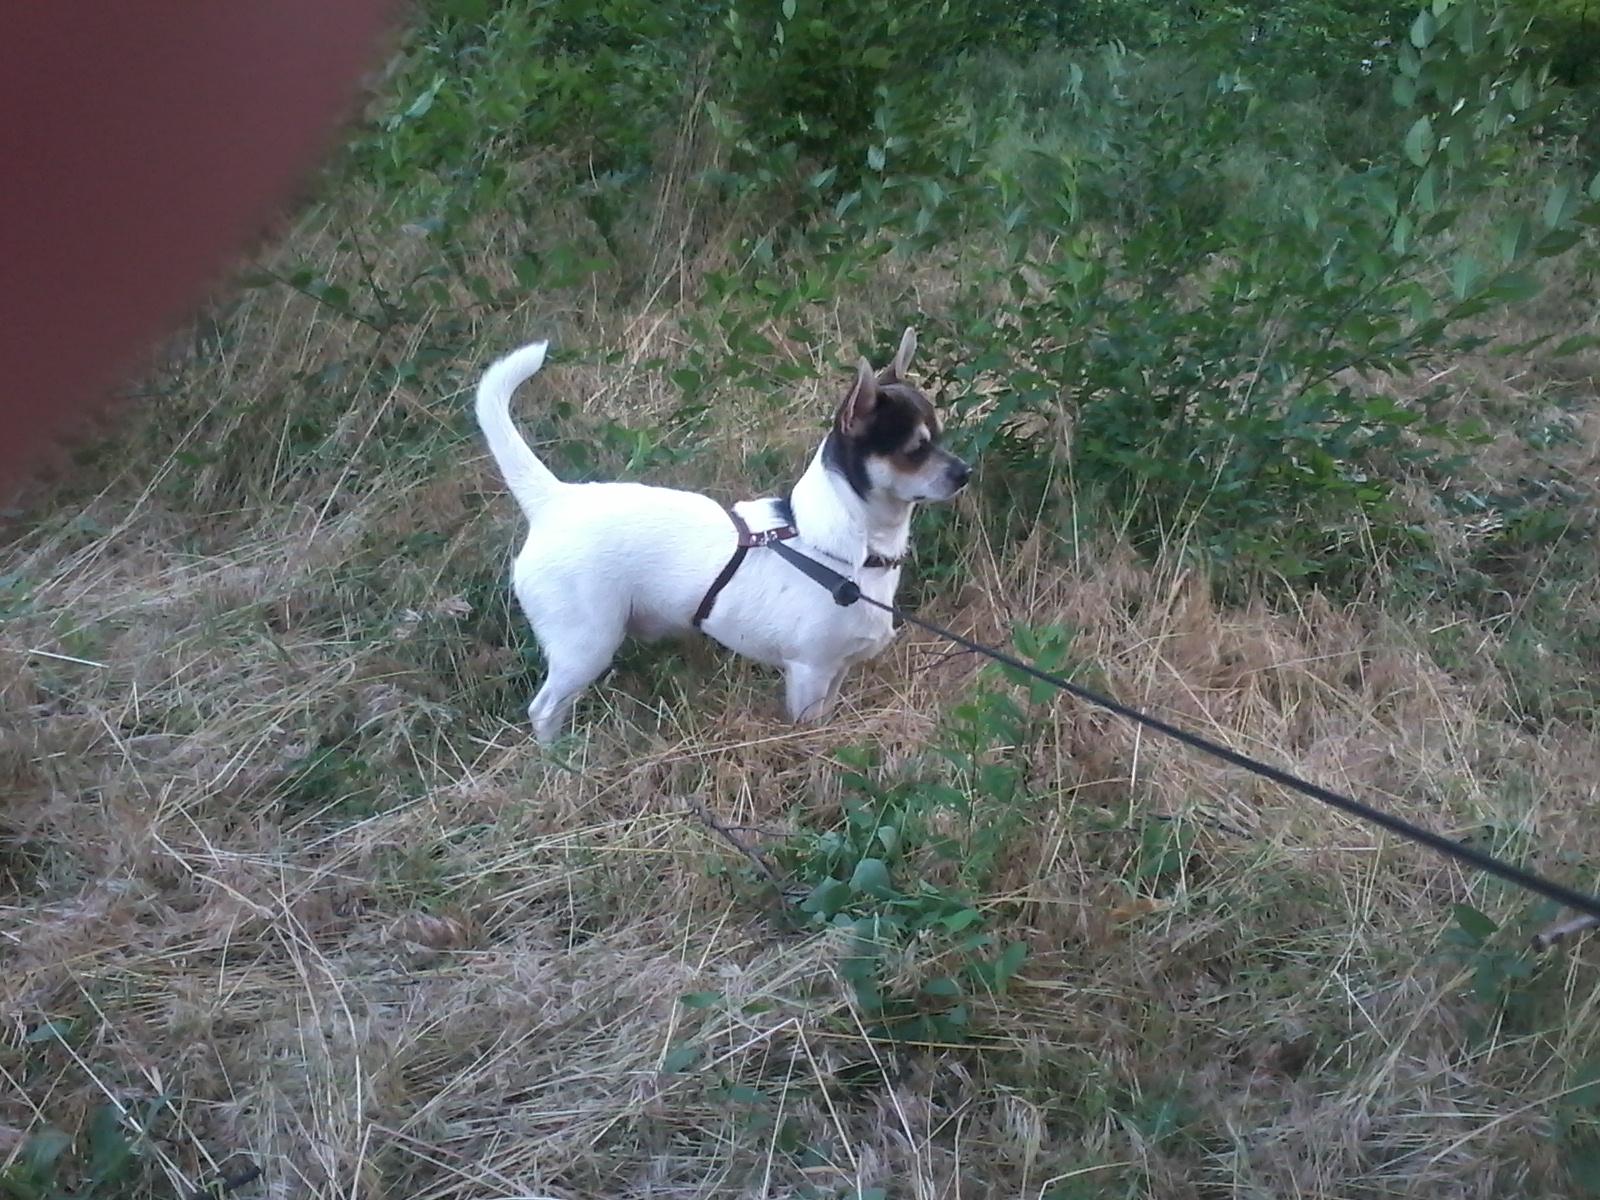 Идентификация собаки -чихуа или нет? - Страница 2 2qvxc87